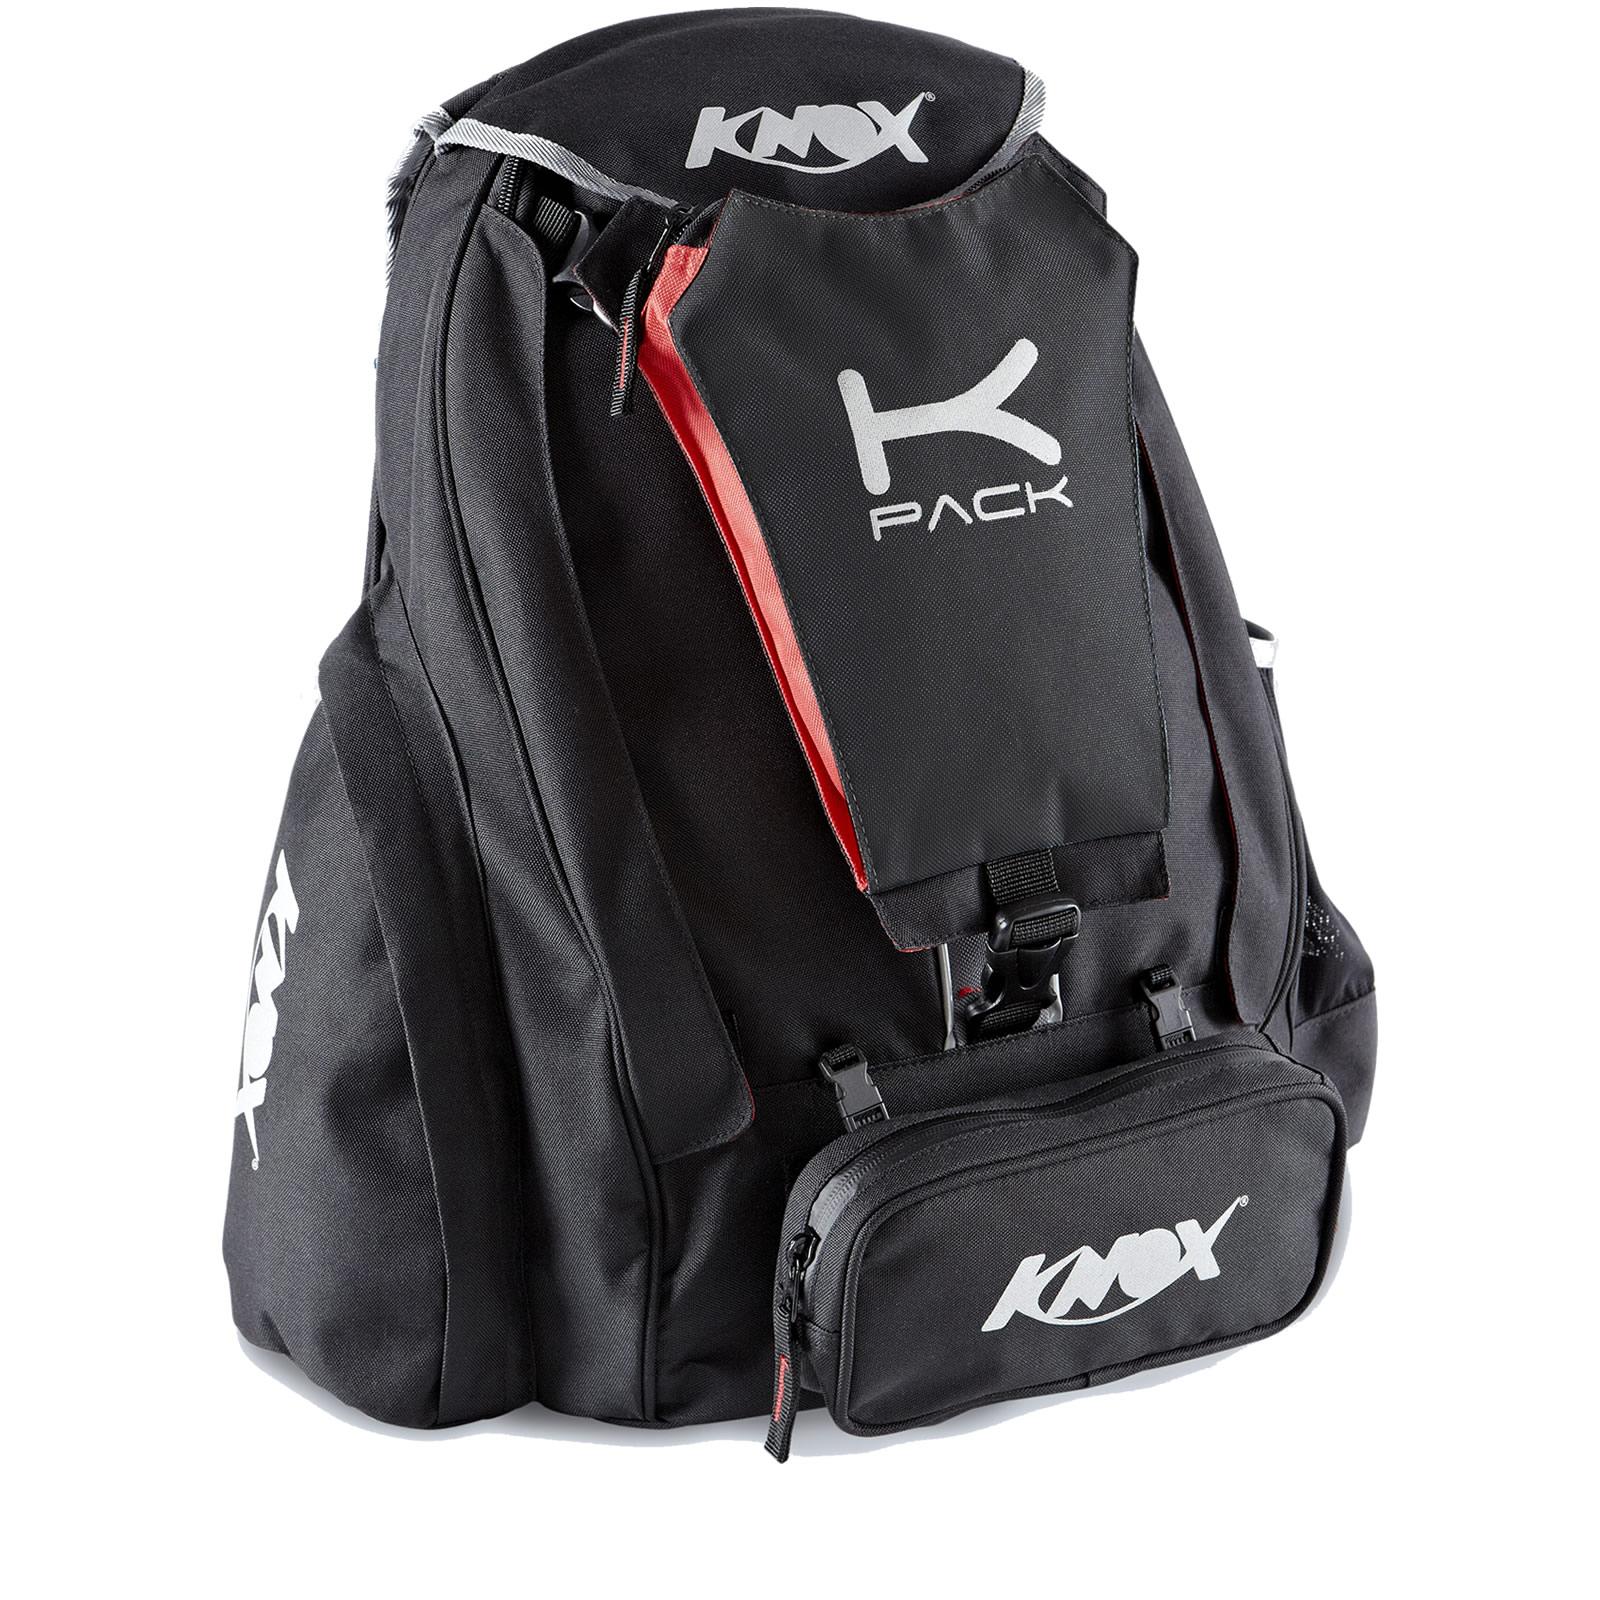 Knox Motorcycle Rucksack